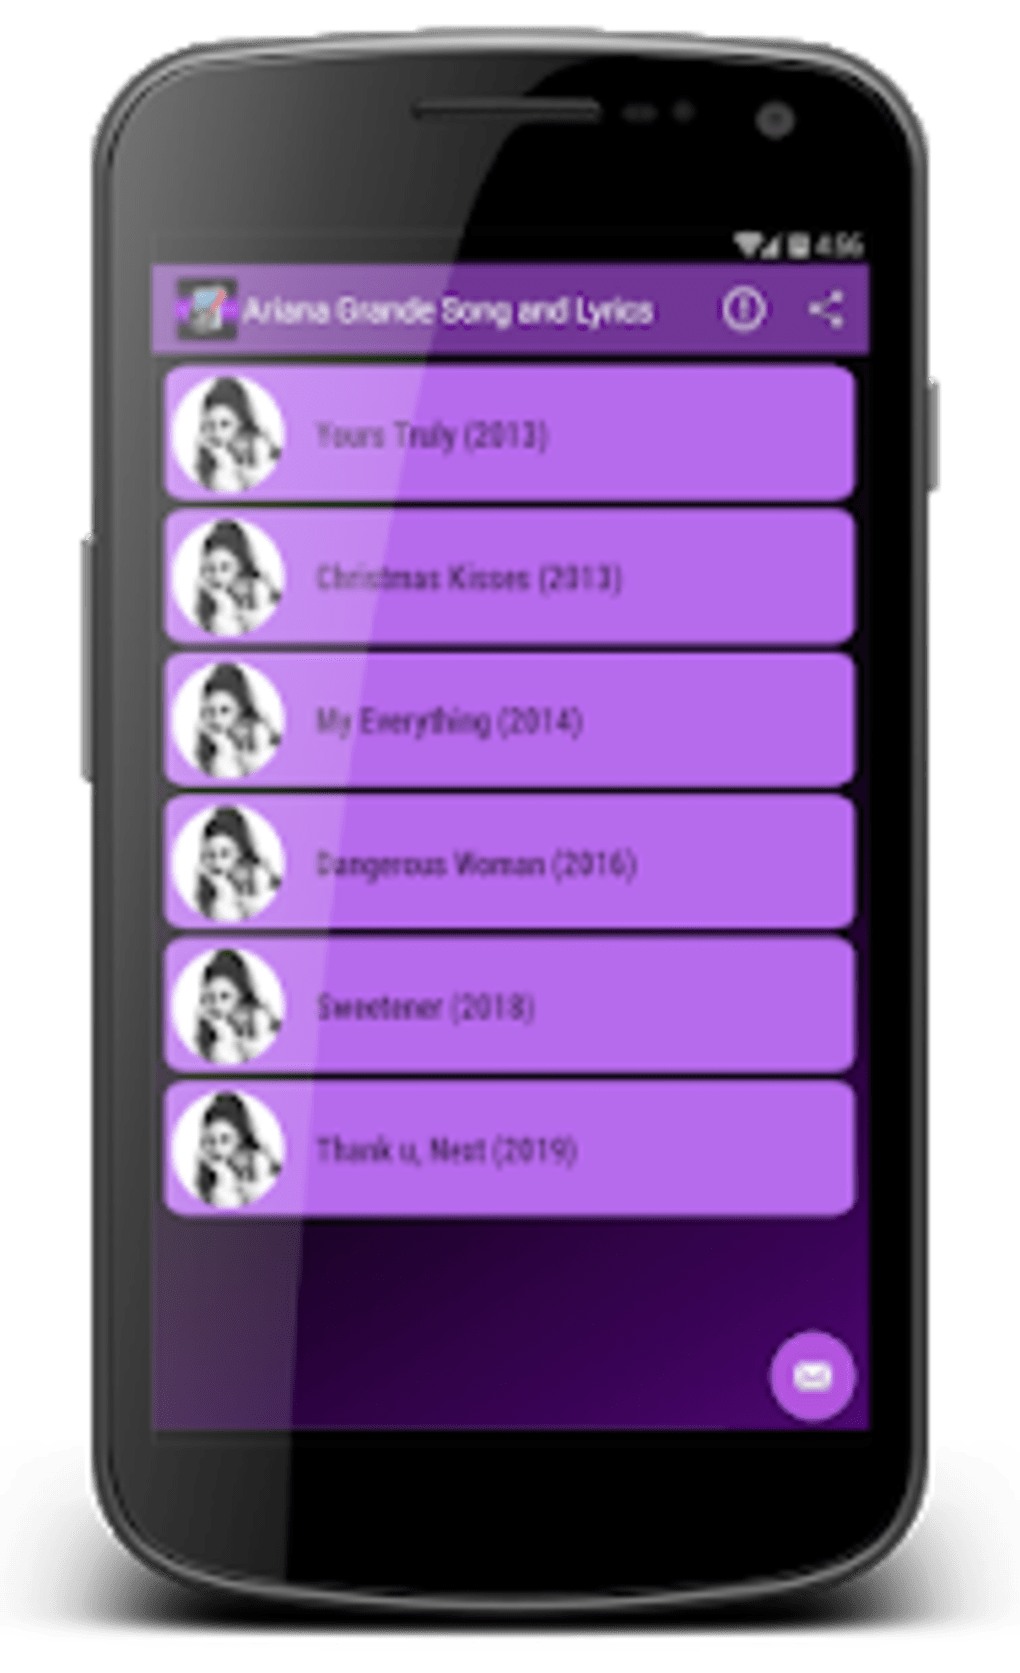 ariana grande 7 rings download free mp3